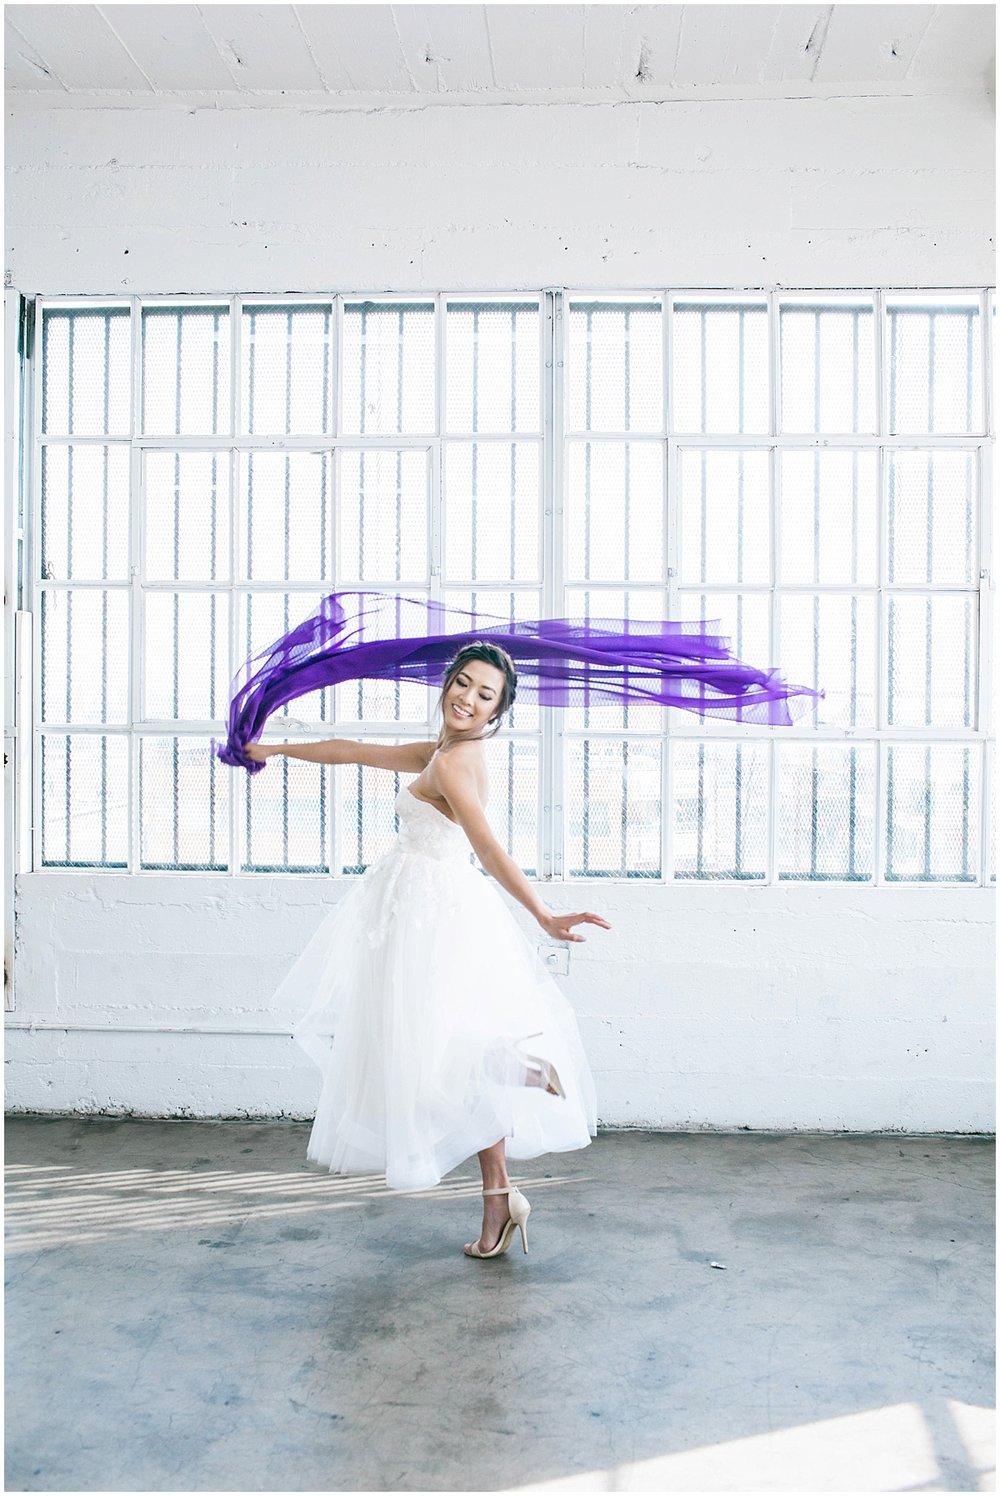 Los-Angeles-Styled-Shoot-Photographer-Carissa-Woo-Photography_0020.jpg